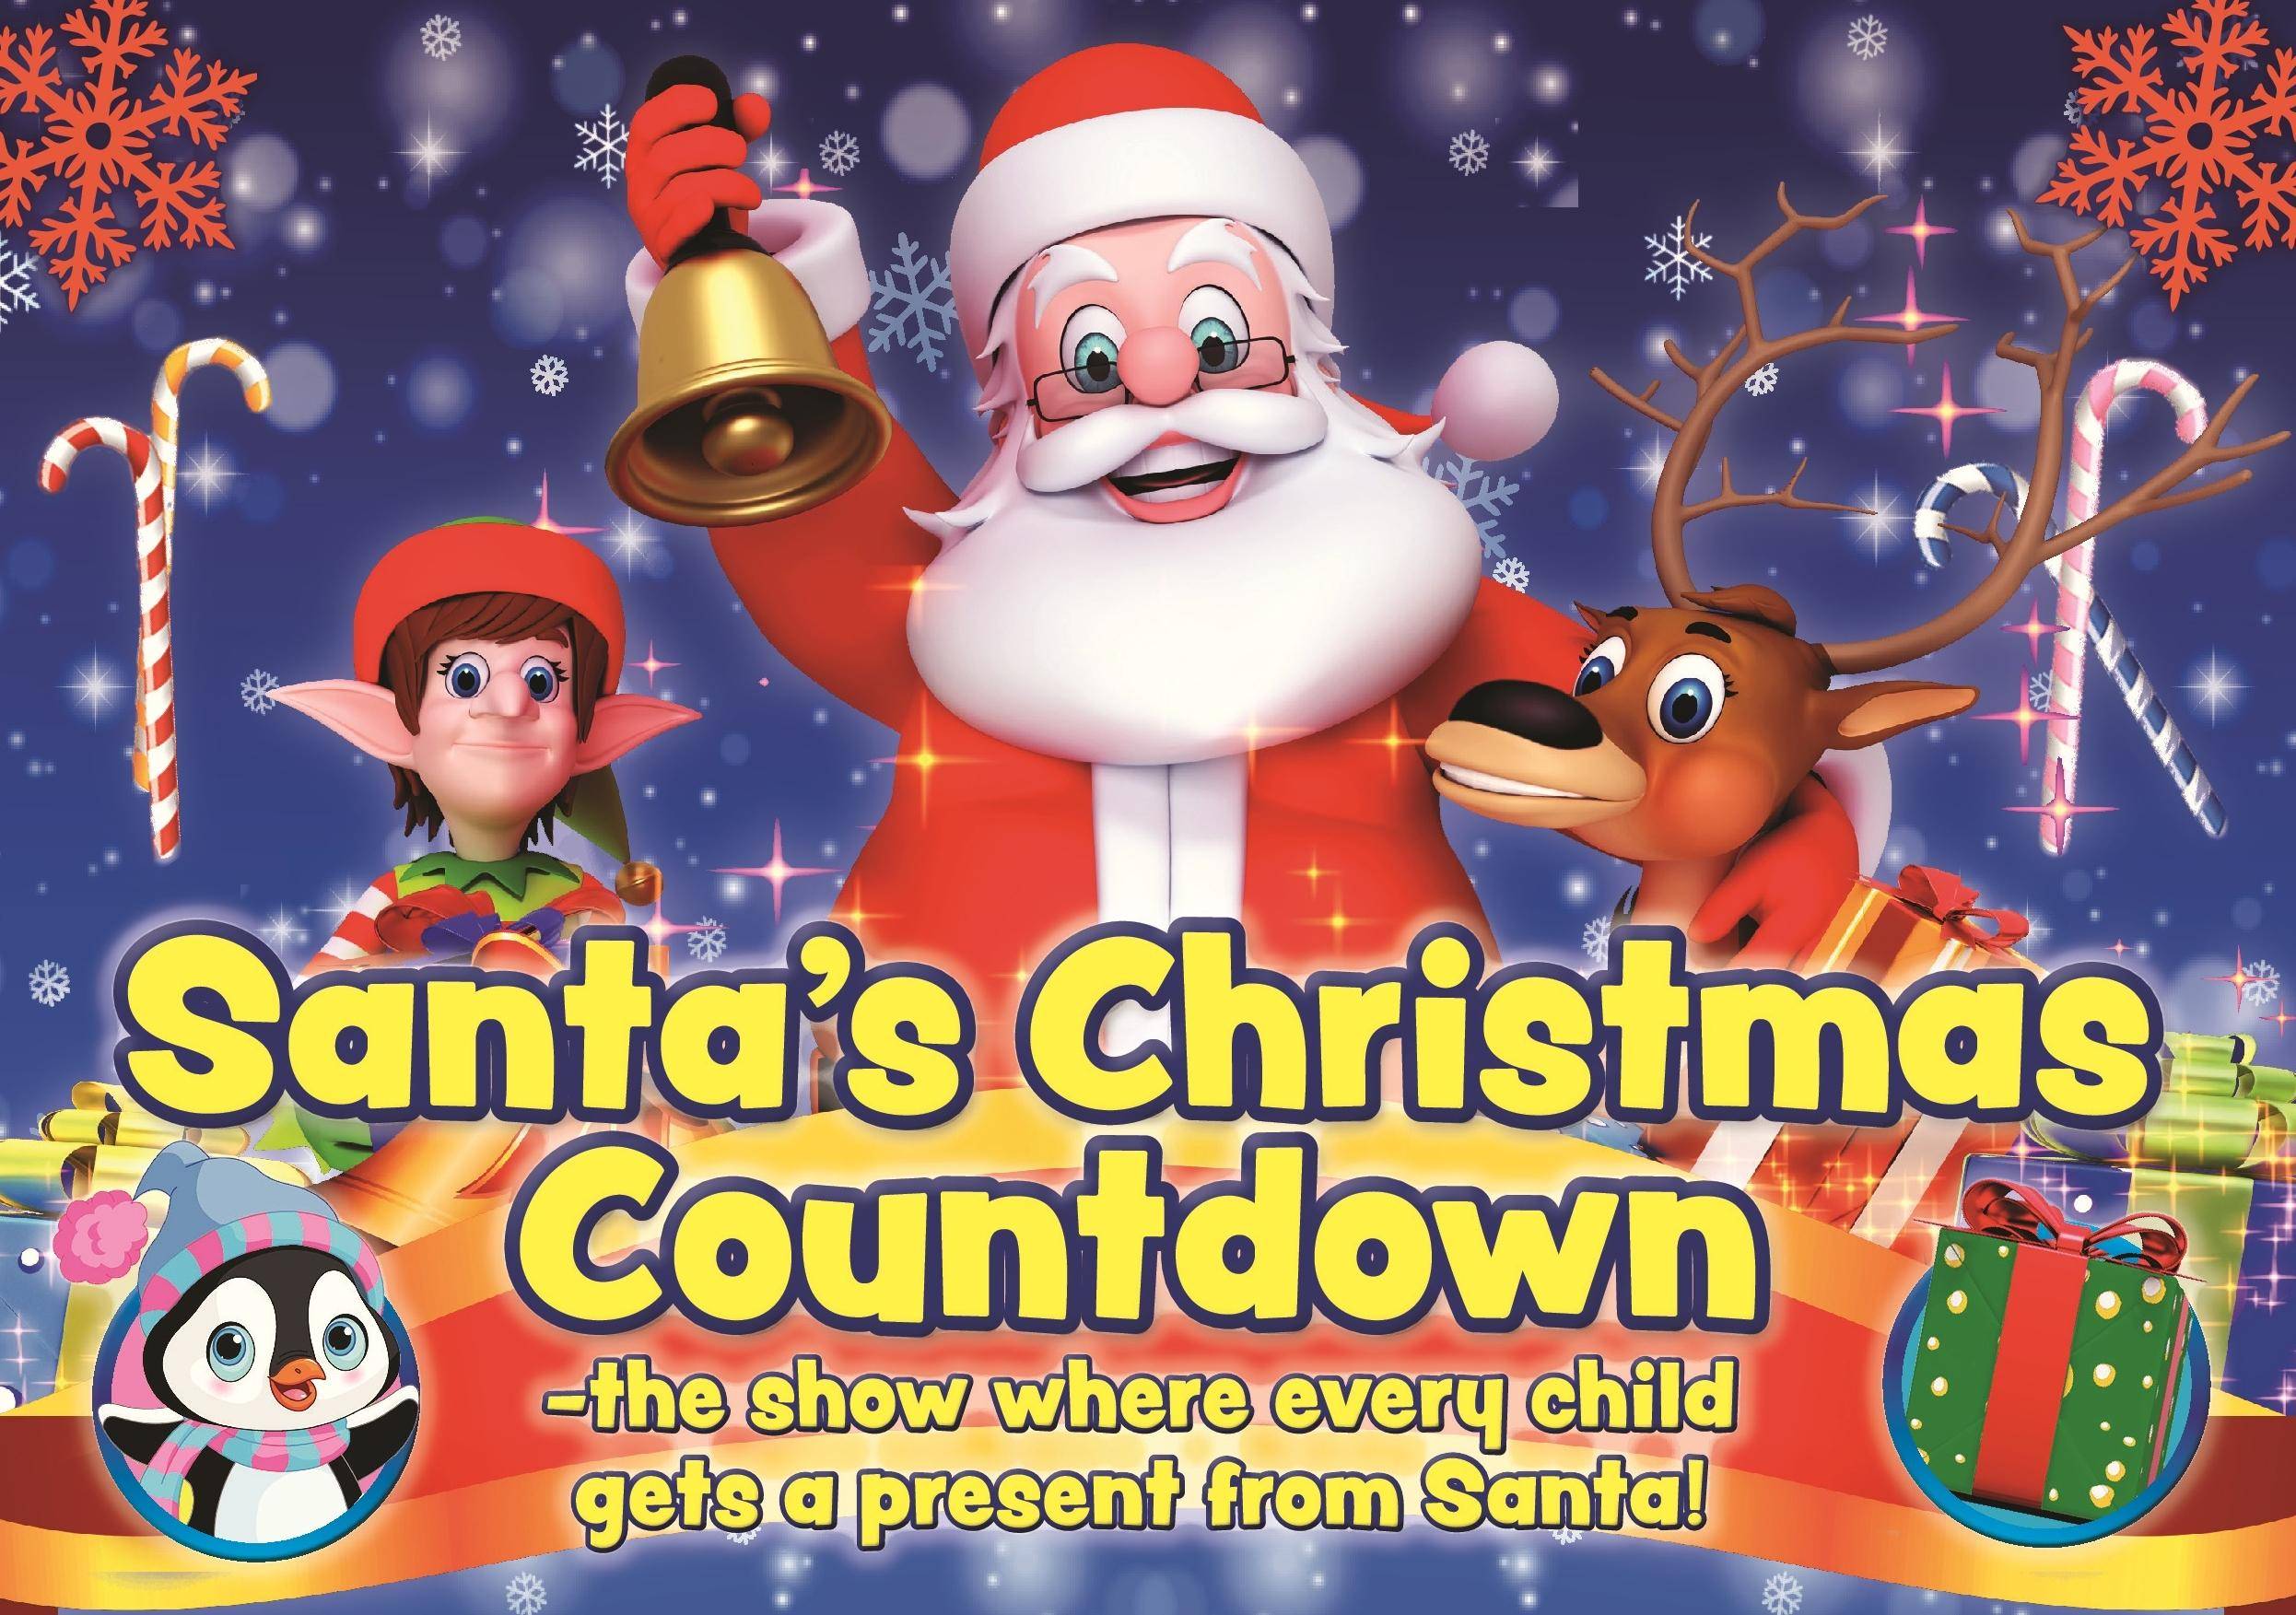 Countdown To Christmas 2019.Santa S Christmas Countdown Bacon Theatre Cheltenham Mon